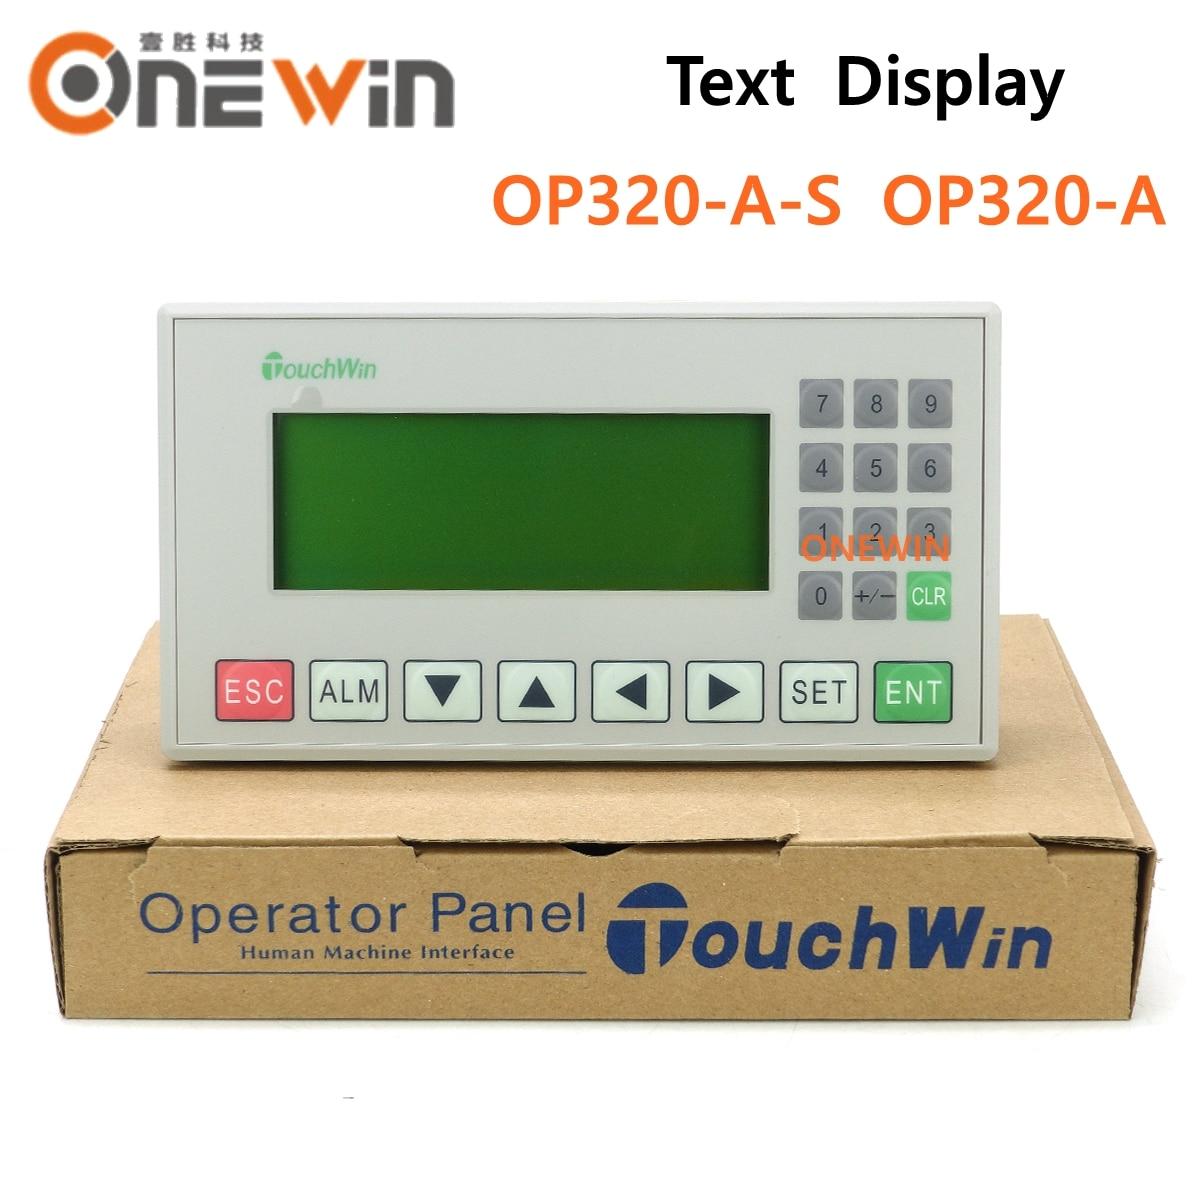 TOUCHWIN XINJE OP320-A-S OP320-A النص عرض دعم STN LCD لون واحد 20 مفاتيح دعم 232 485 الاتصالات منافذ